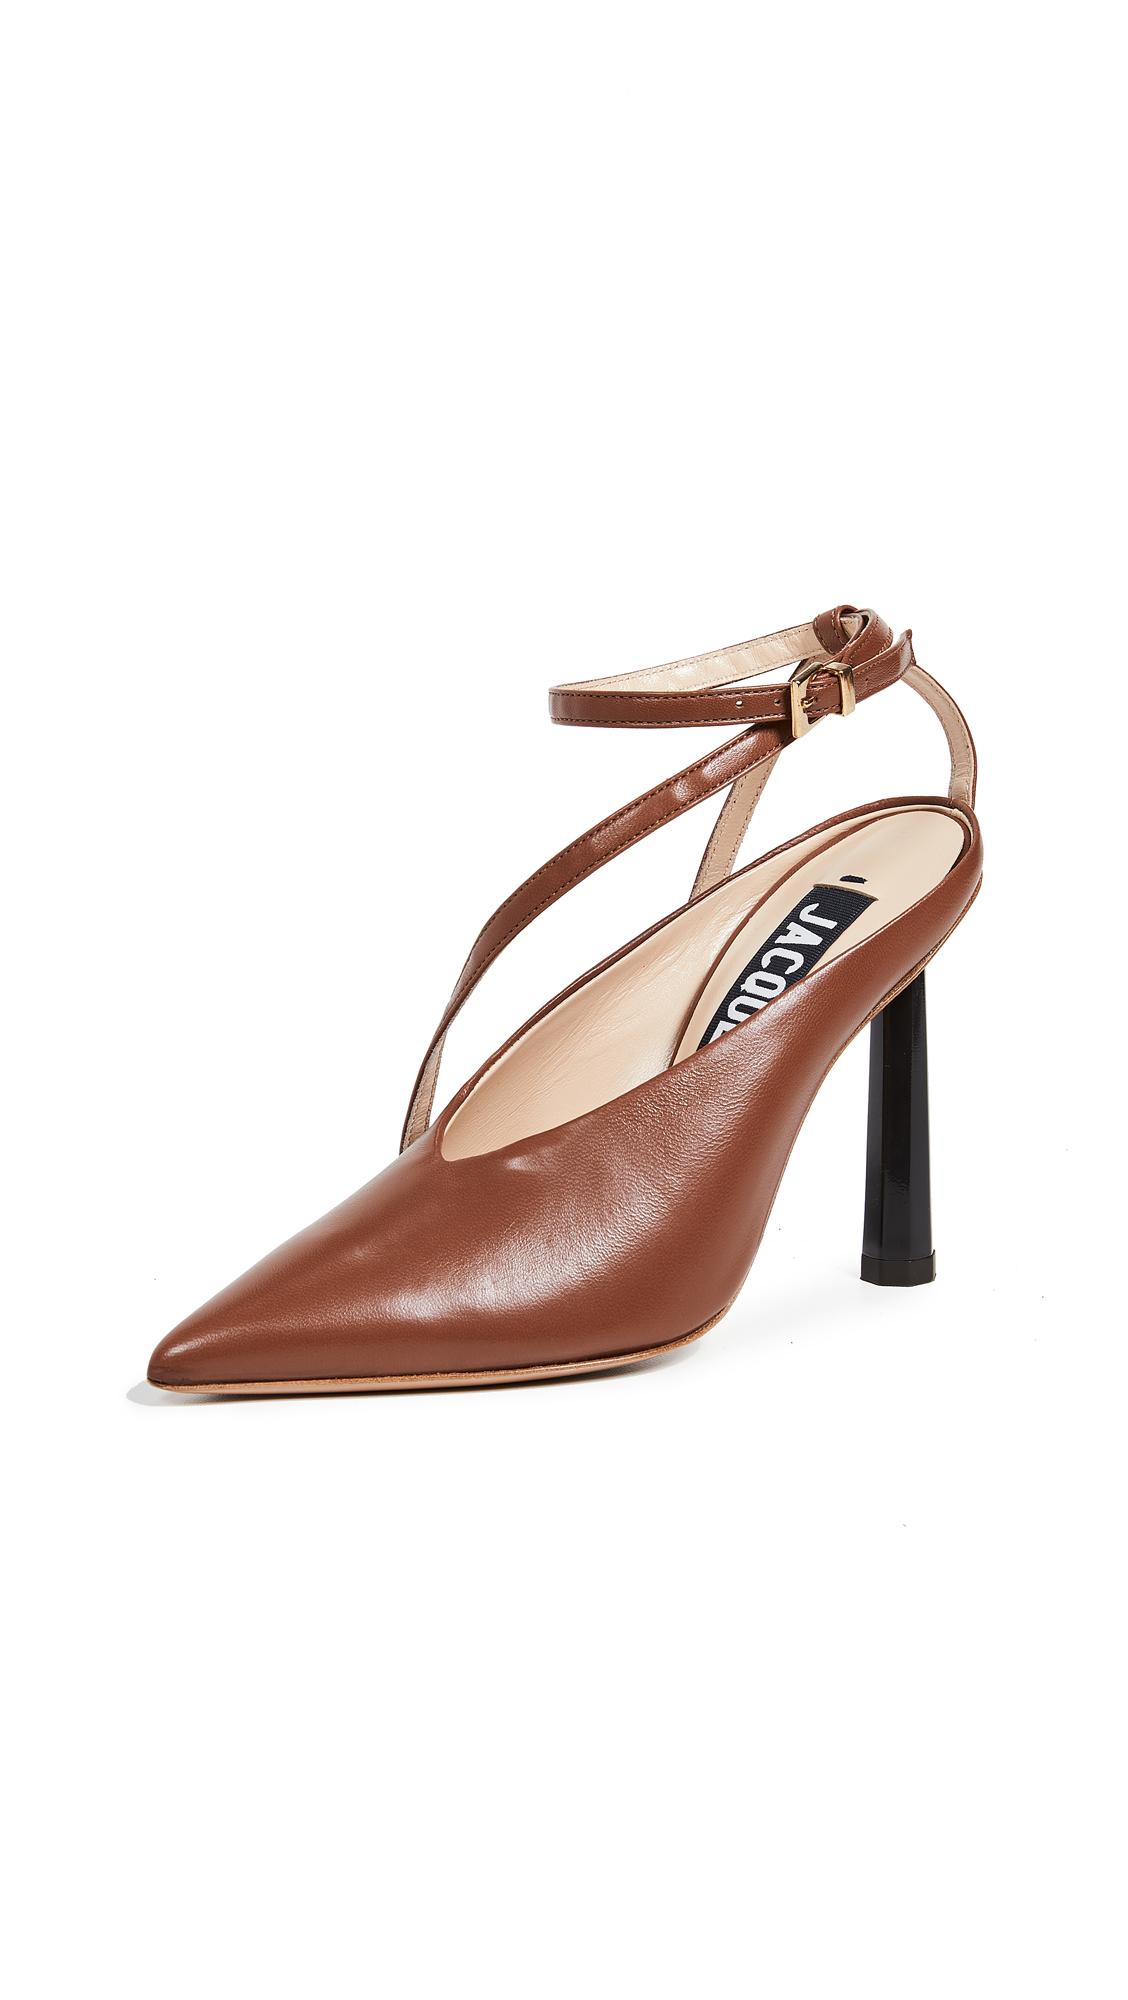 Jacquemus Les Chaussures Faya Pumps